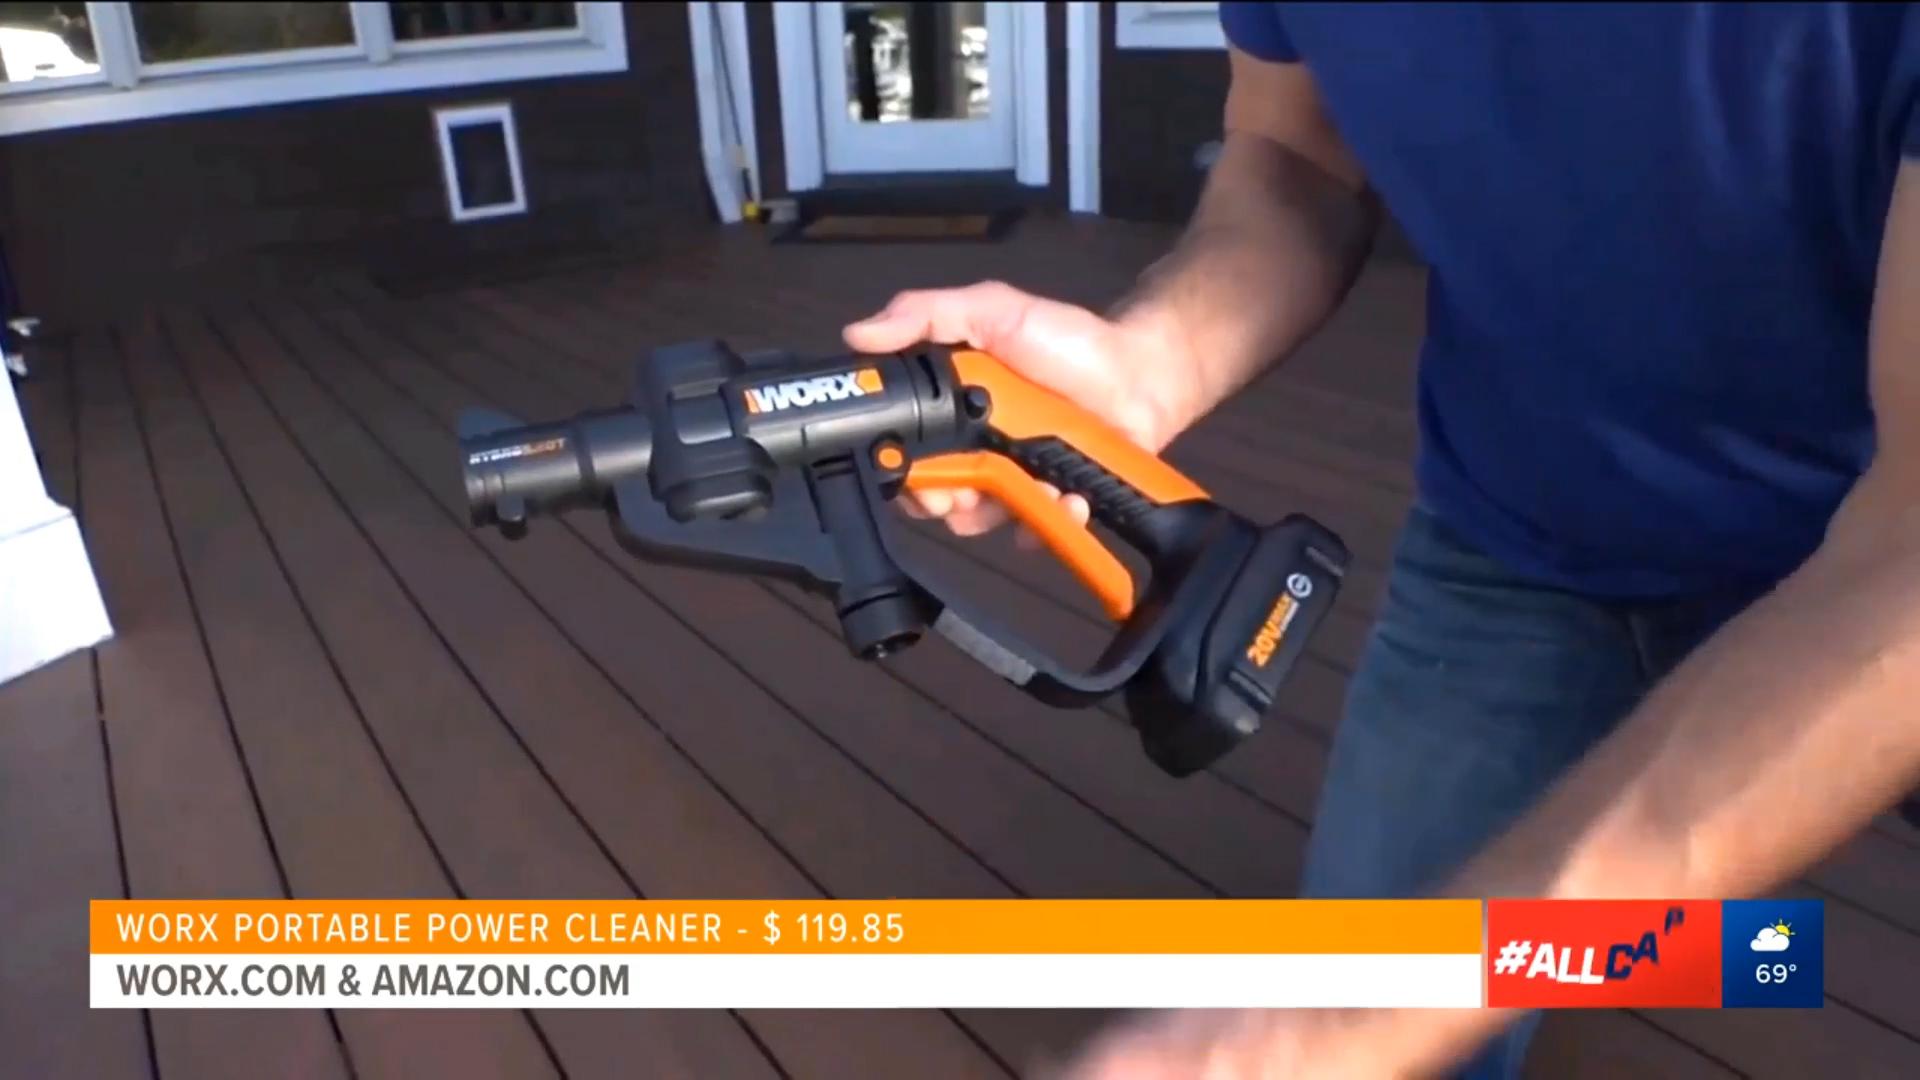 WORX HYDROSHOT PORTABLE POWER CLEANER - $119.85Shop Nowvia Worx or Amazon